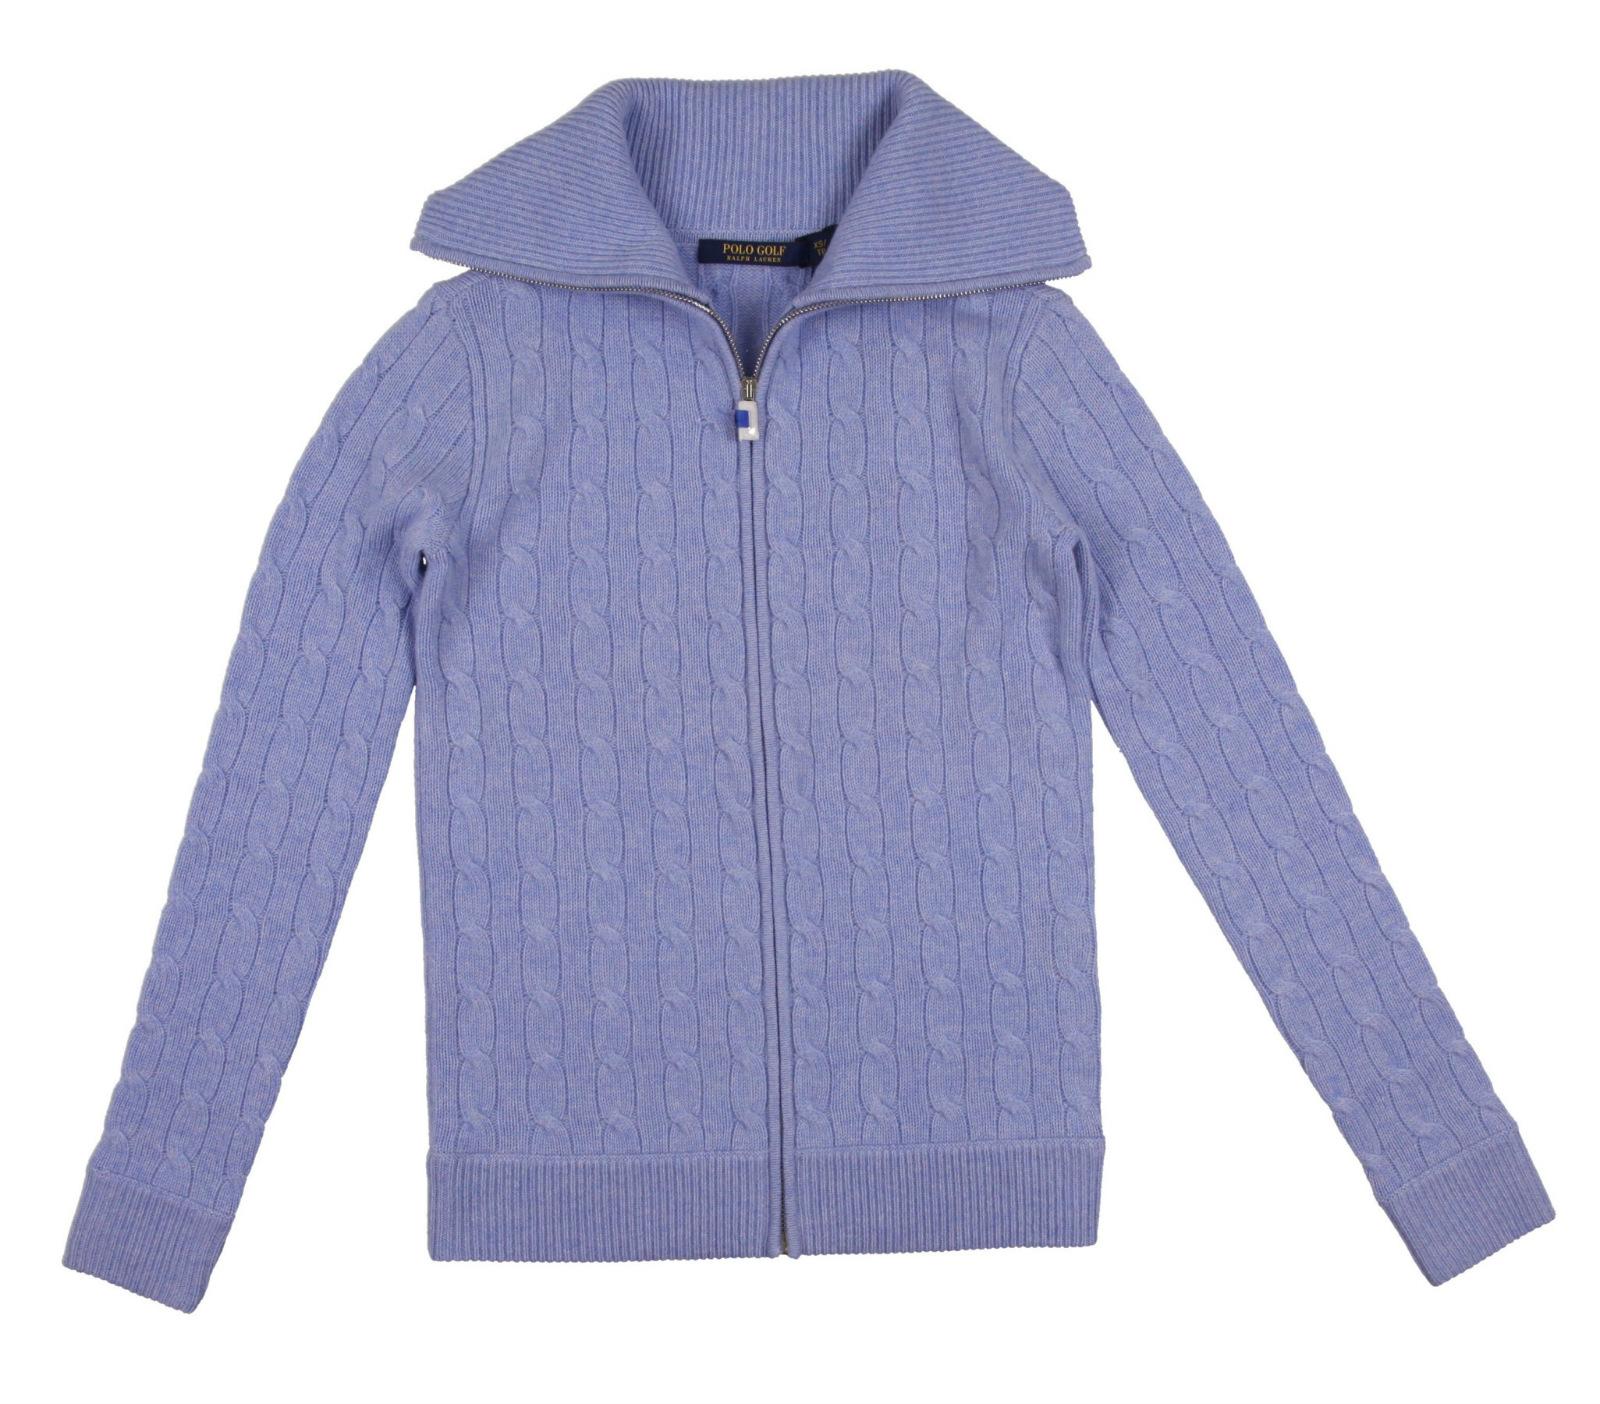 NEW WomenS Ralph Lauren Cable Knit Cashmere Golf Sweater ...